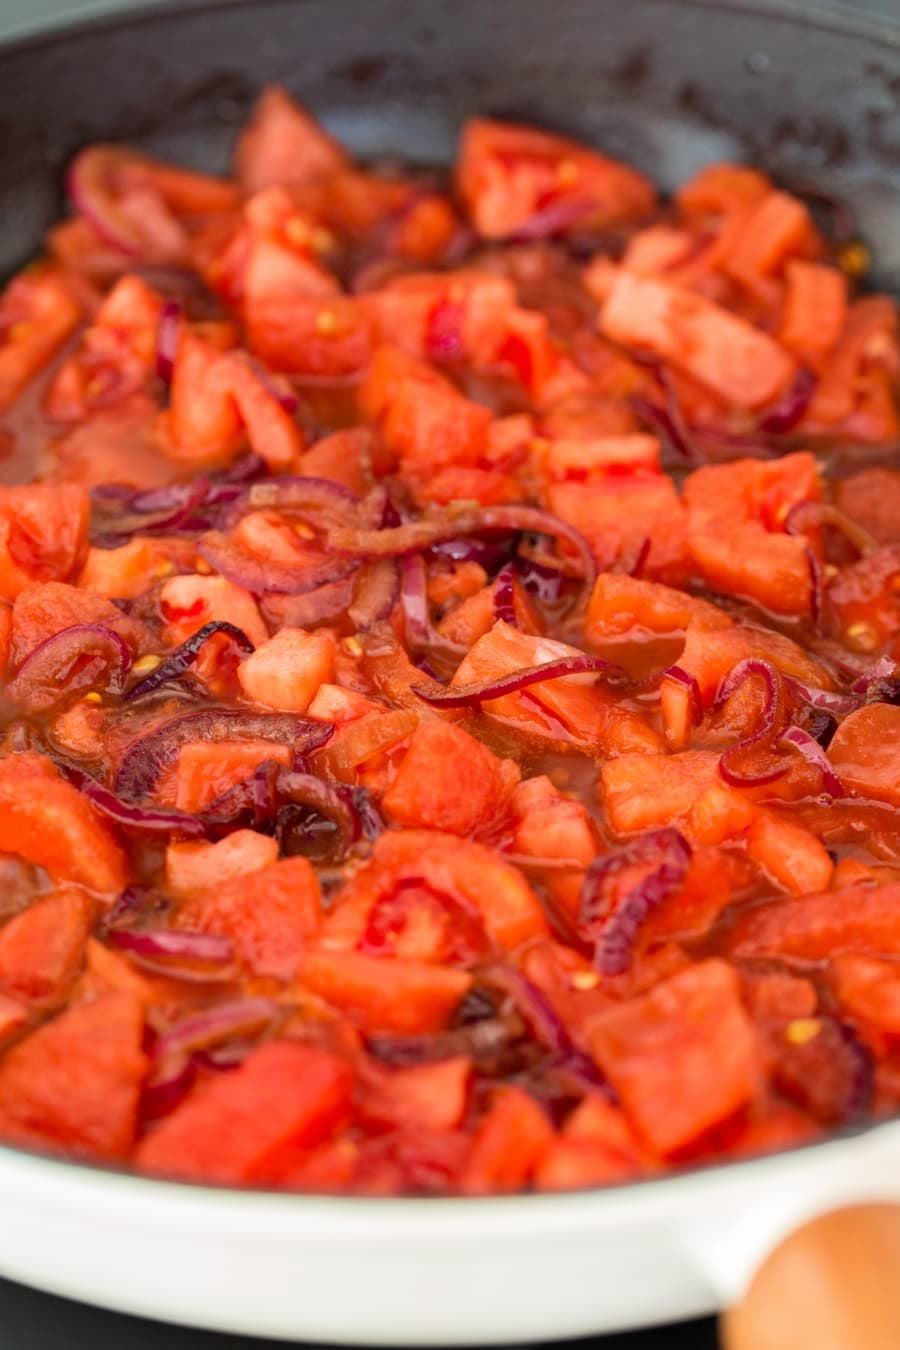 Balsamico onion and tomato sauce.